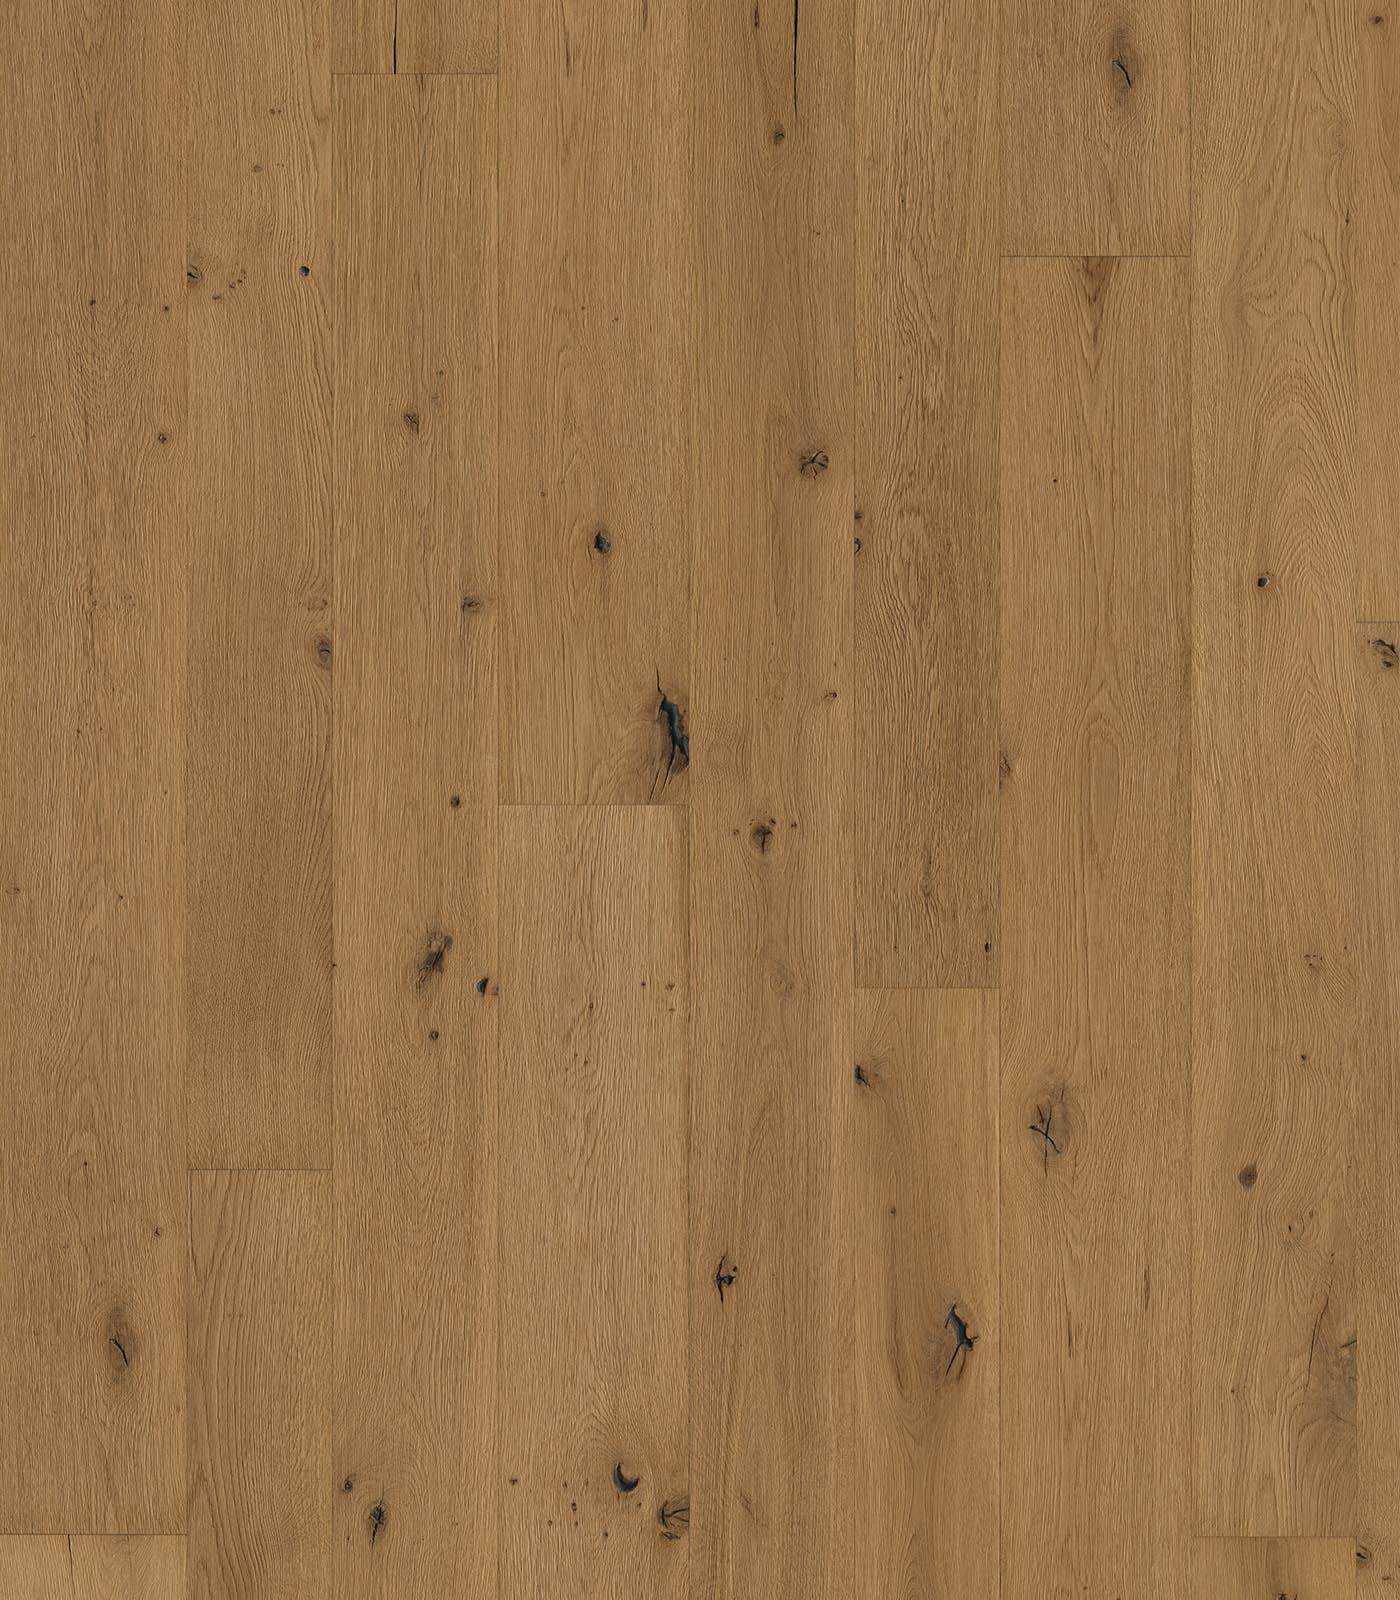 Cordoba-European Oak Floors-Heritage Collection-flat